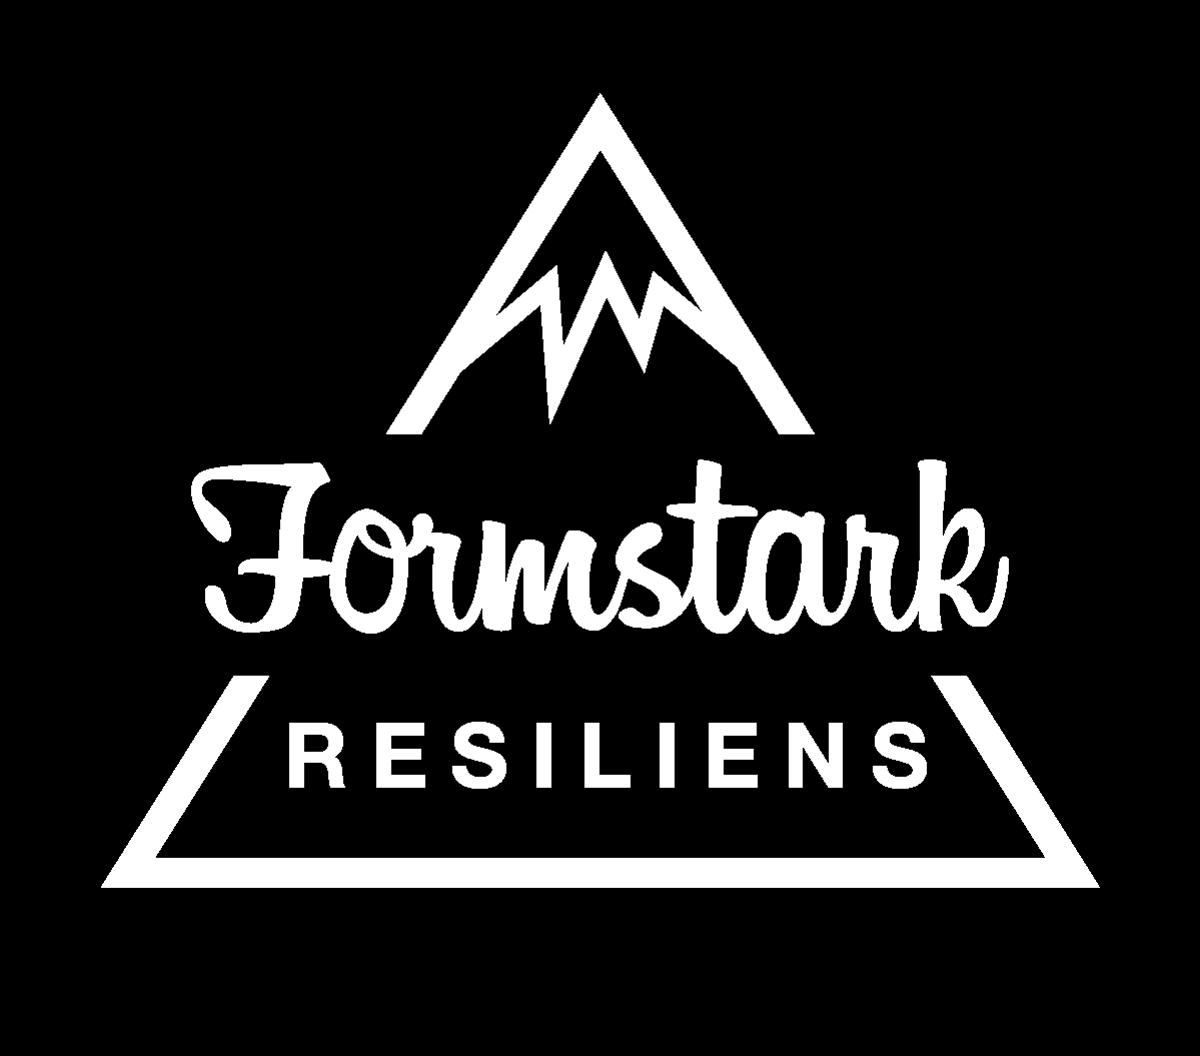 Formstark resiliens